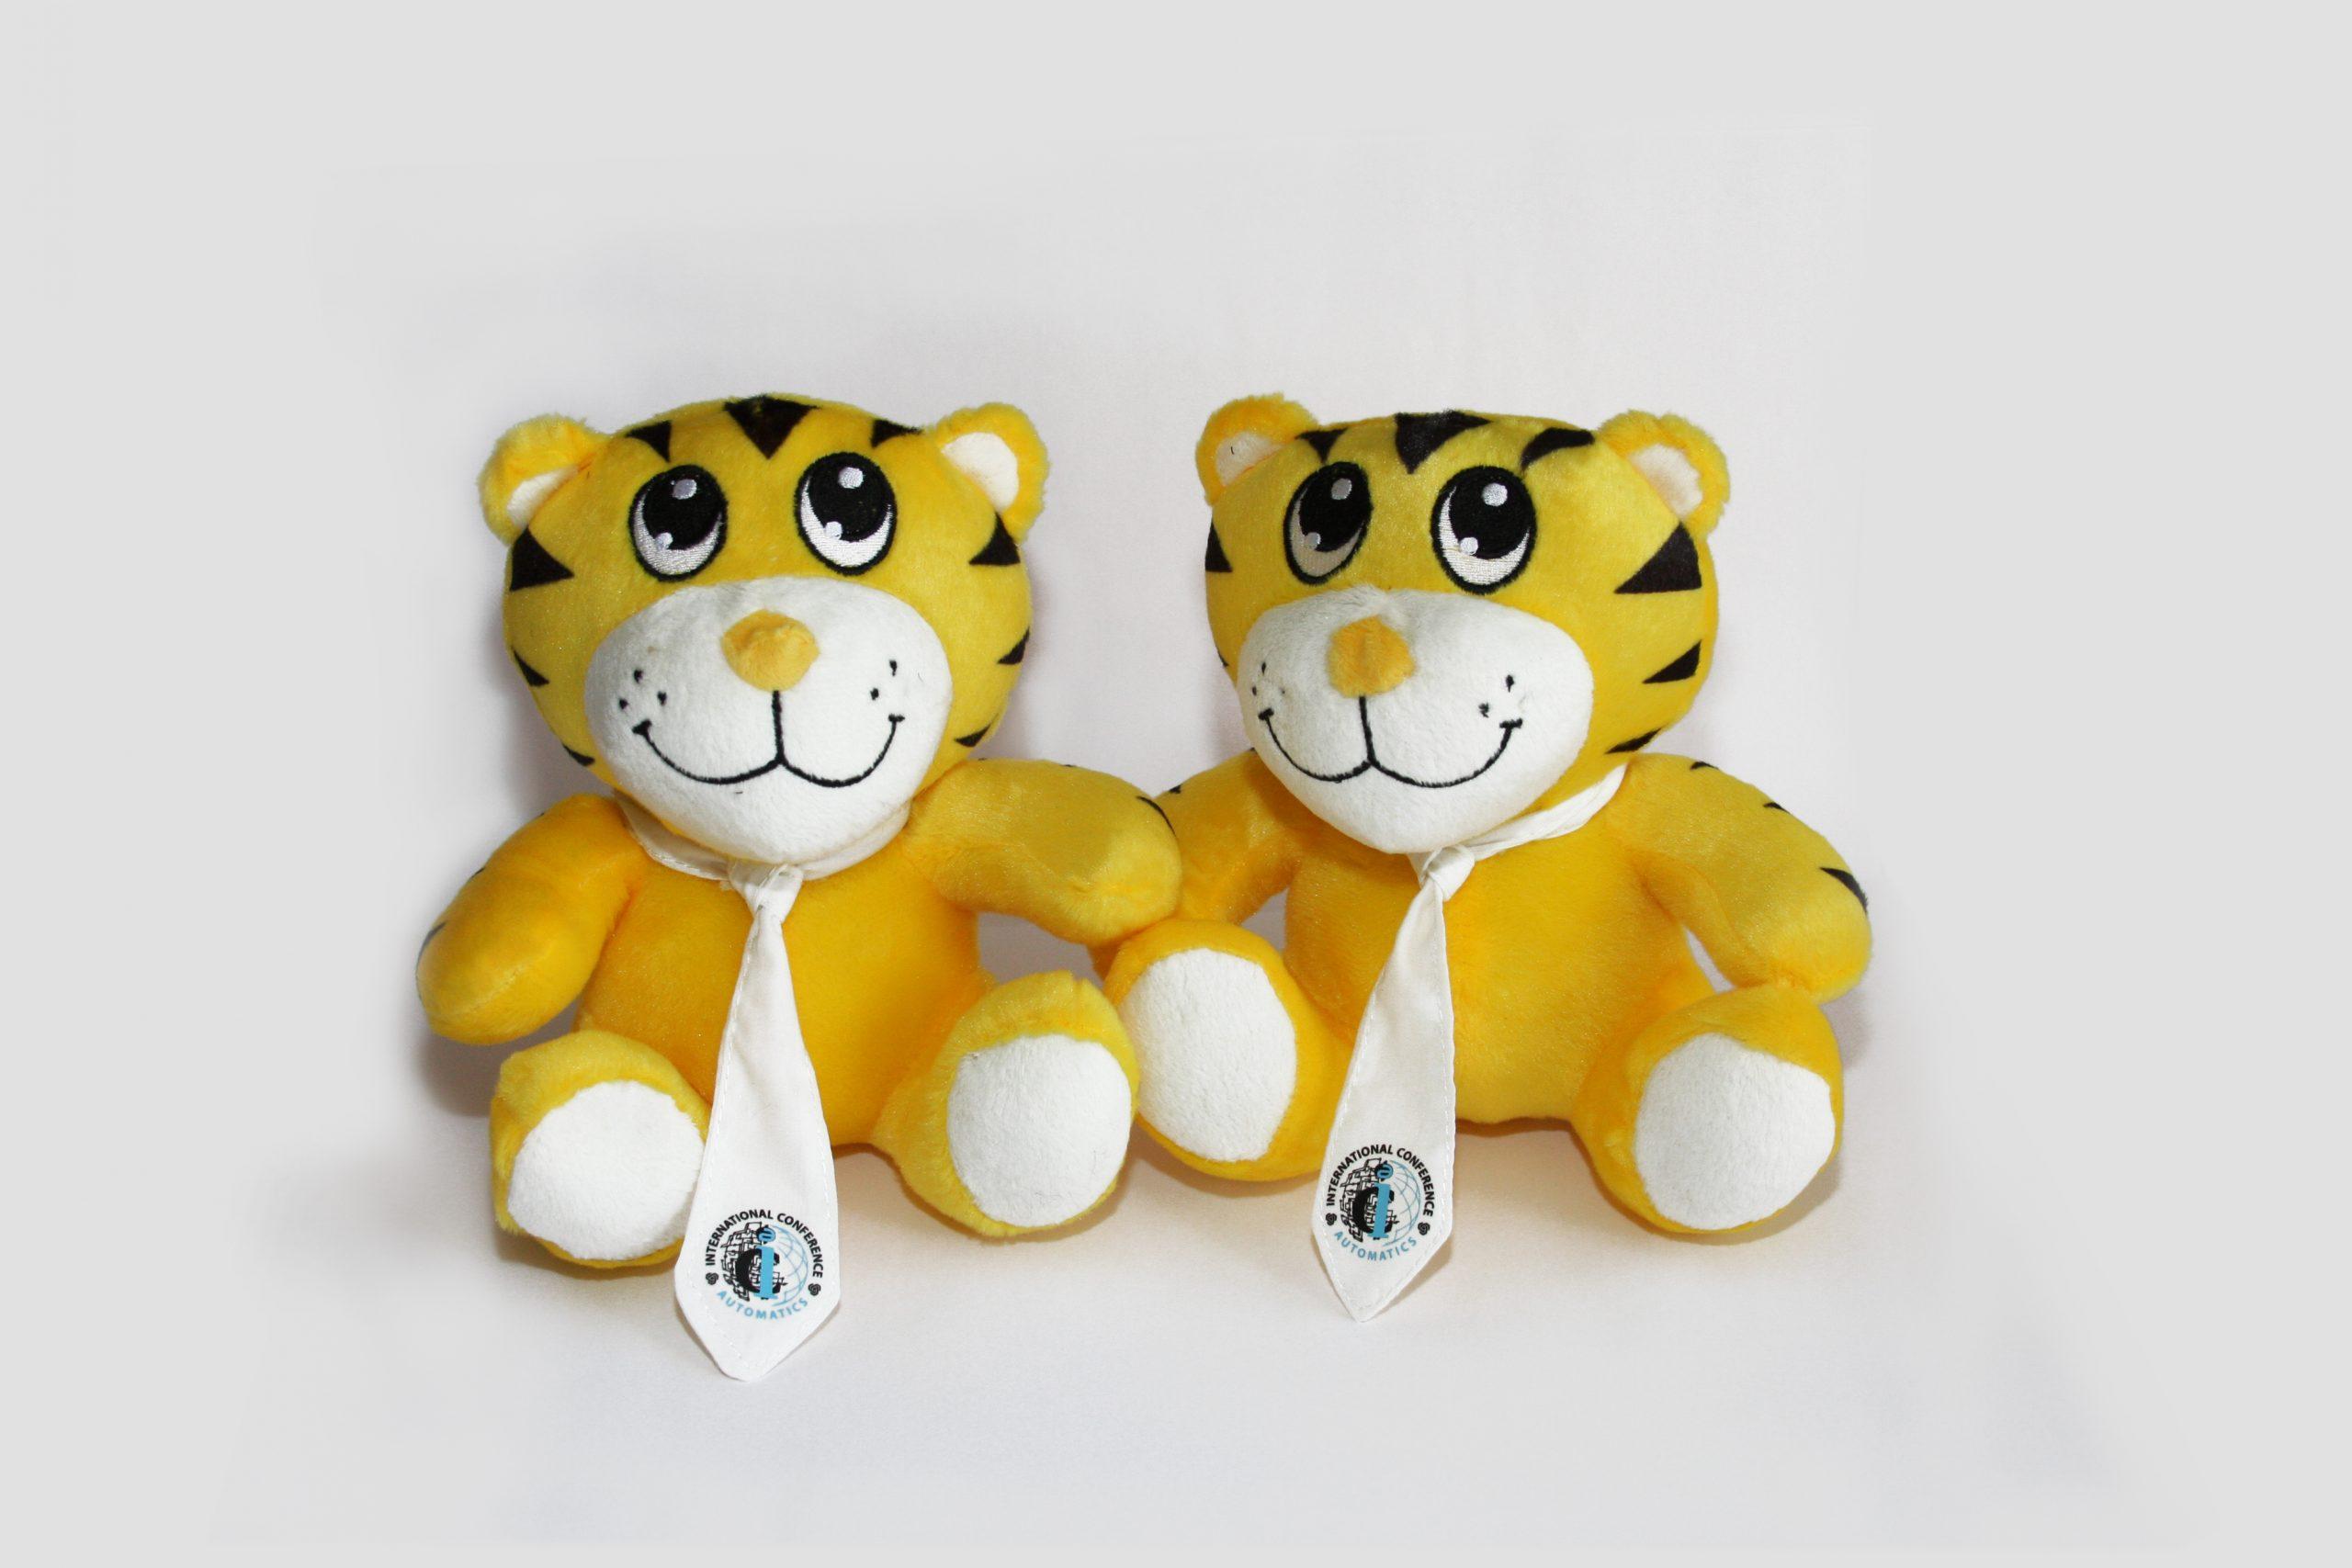 Tiger Toys, Technical University 2020